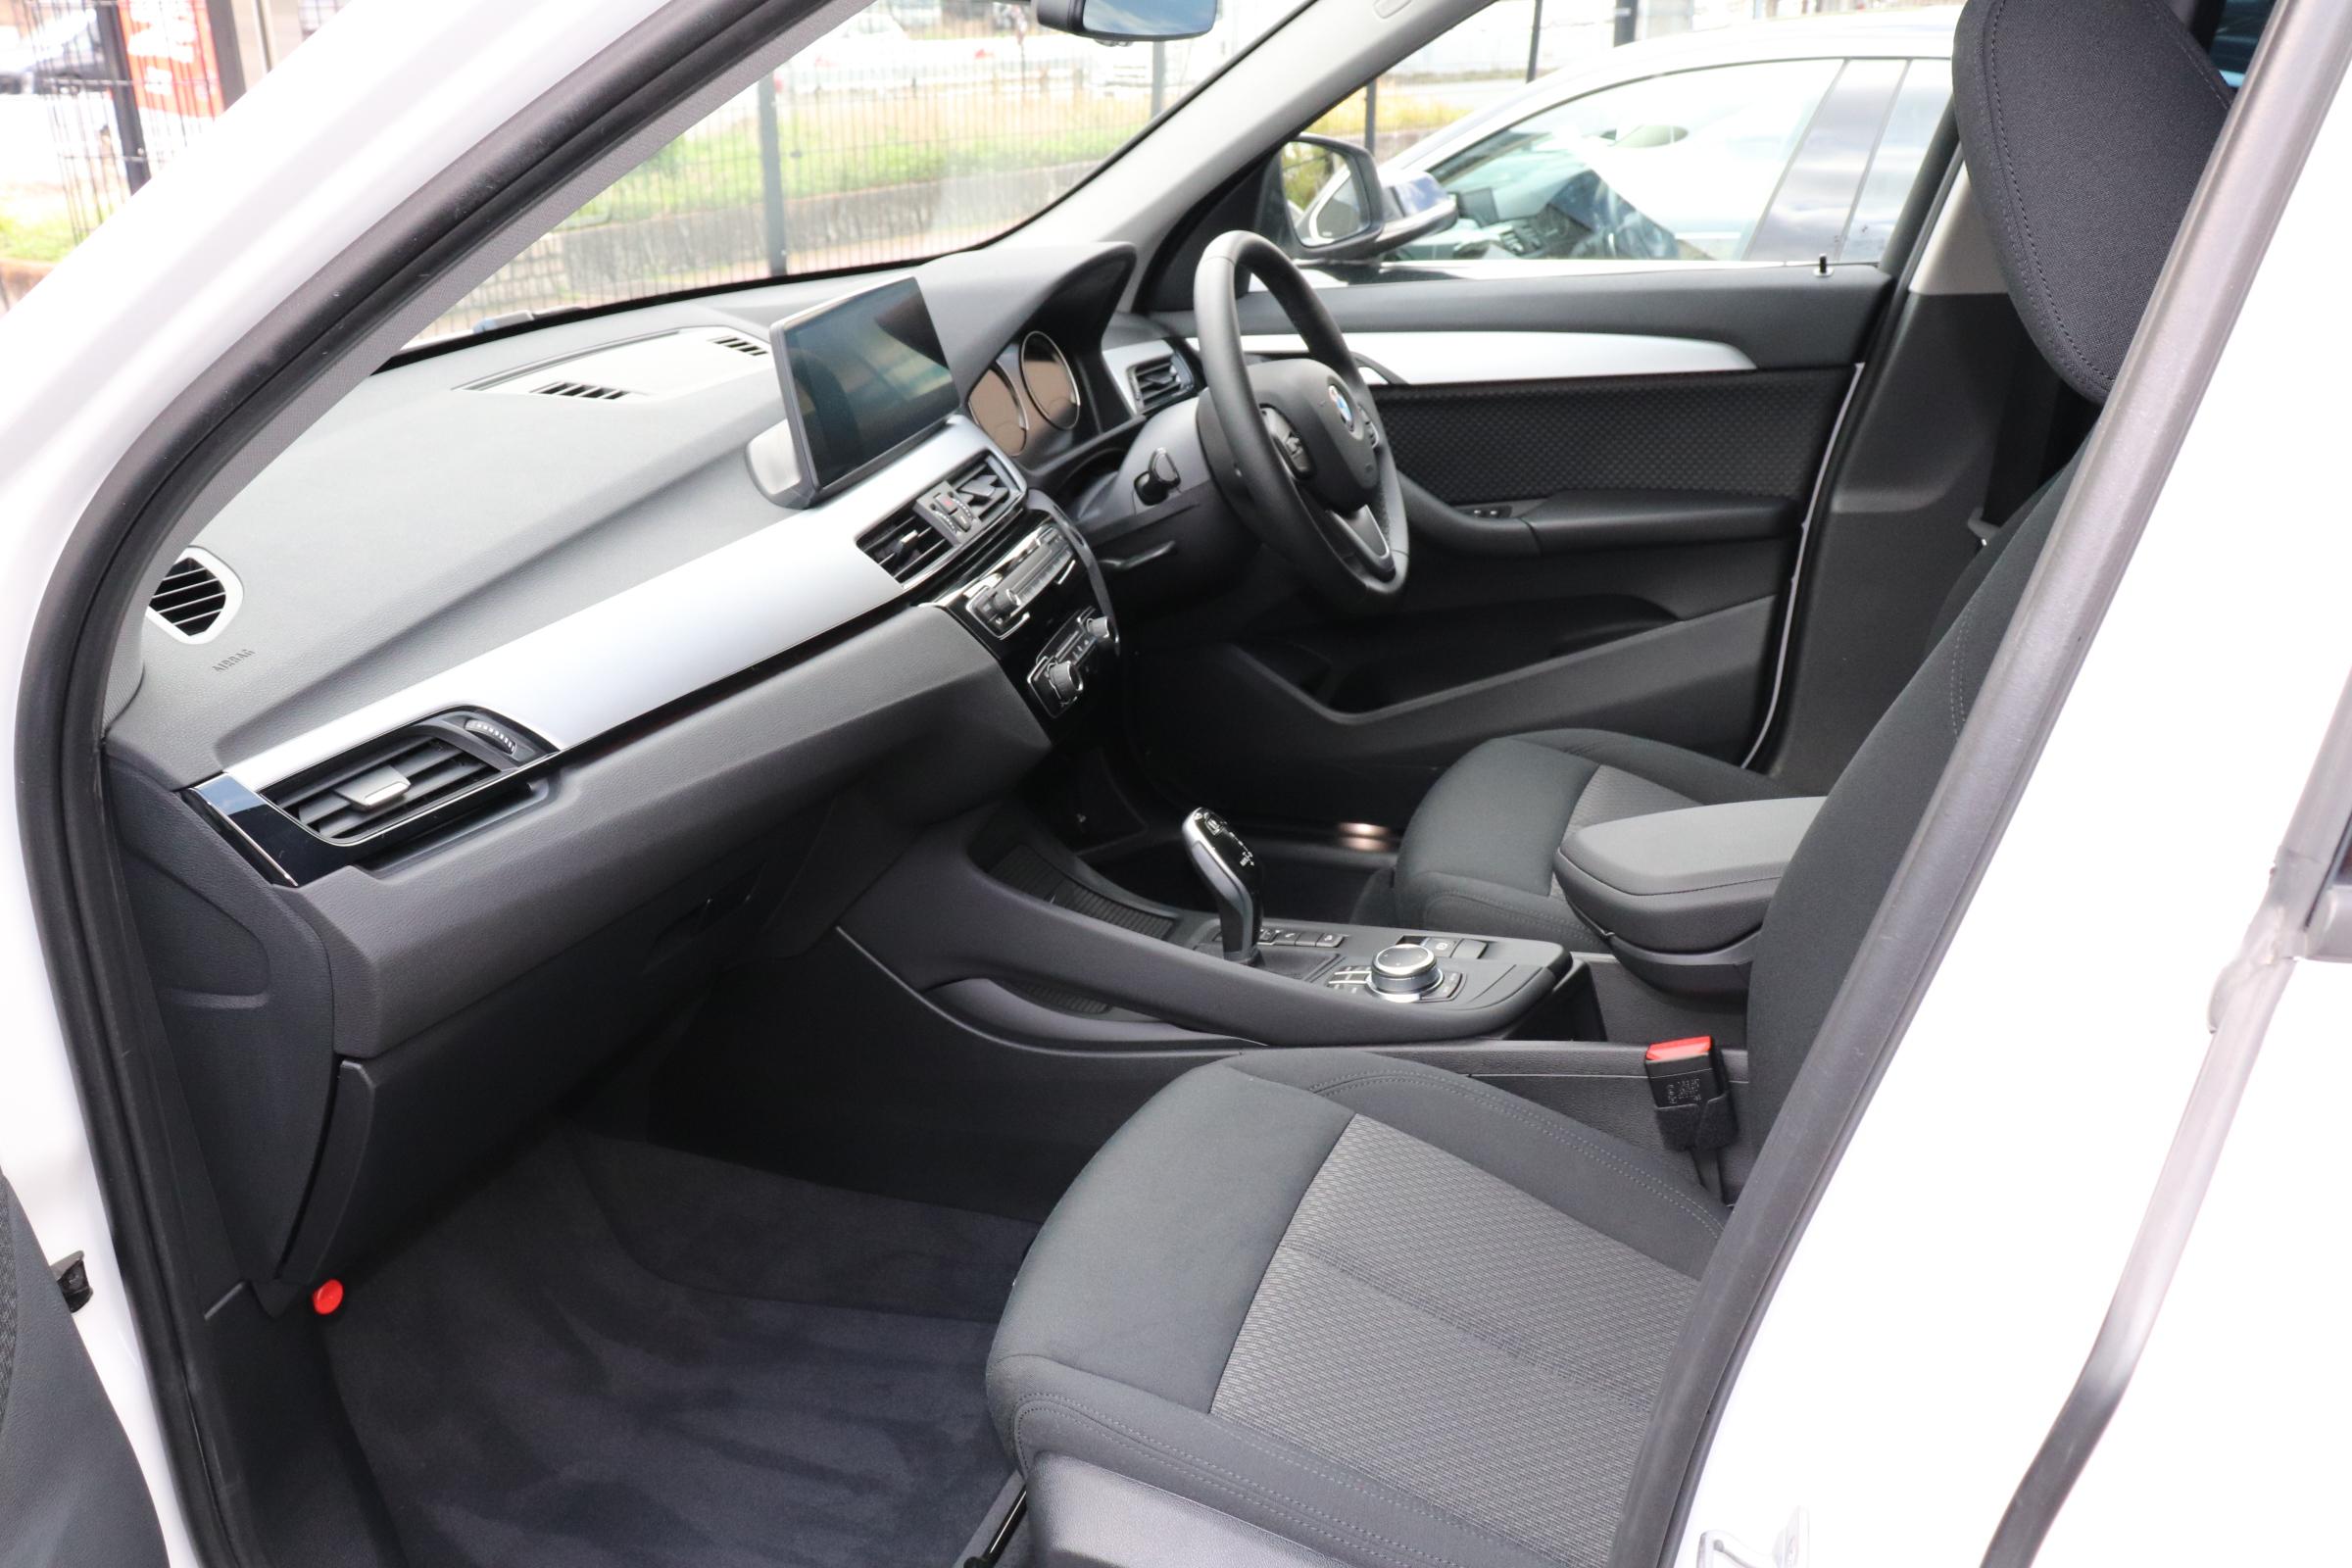 X1 xDrive 18d 後期モデル コンフォートアクセス インテリセーフ車両画像13